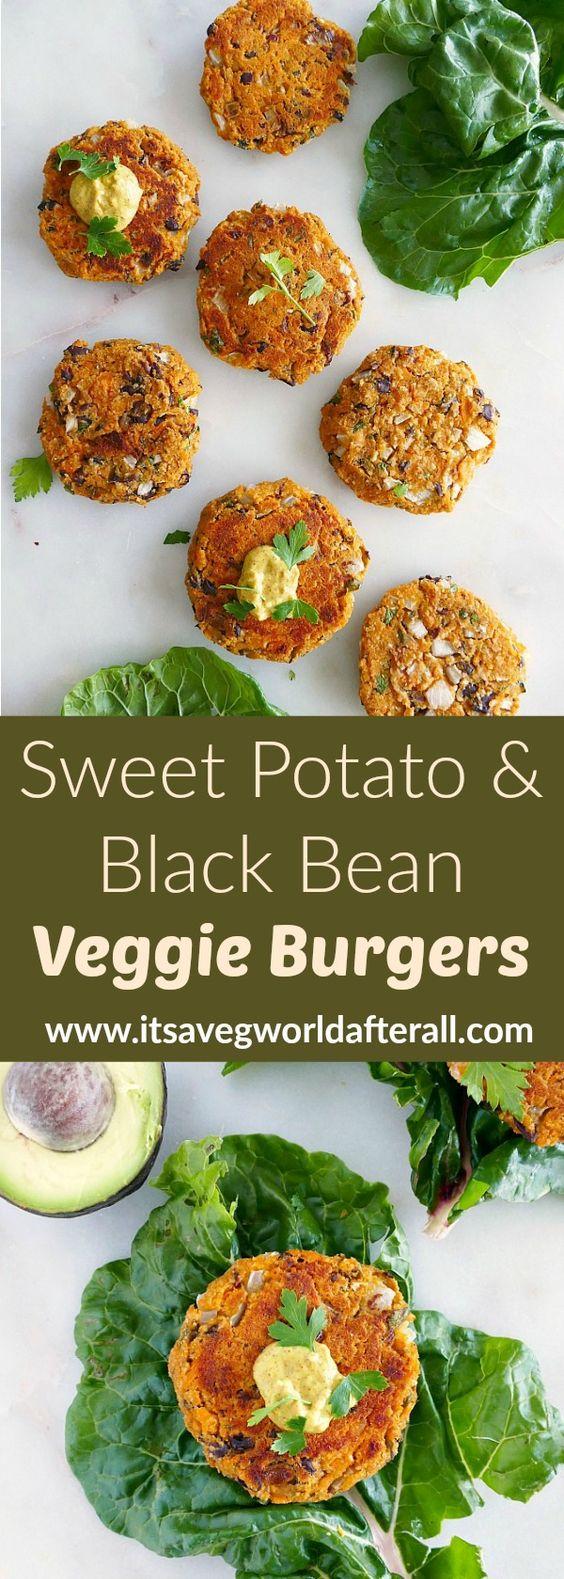 Sweet Potato and Black Bean Burgers